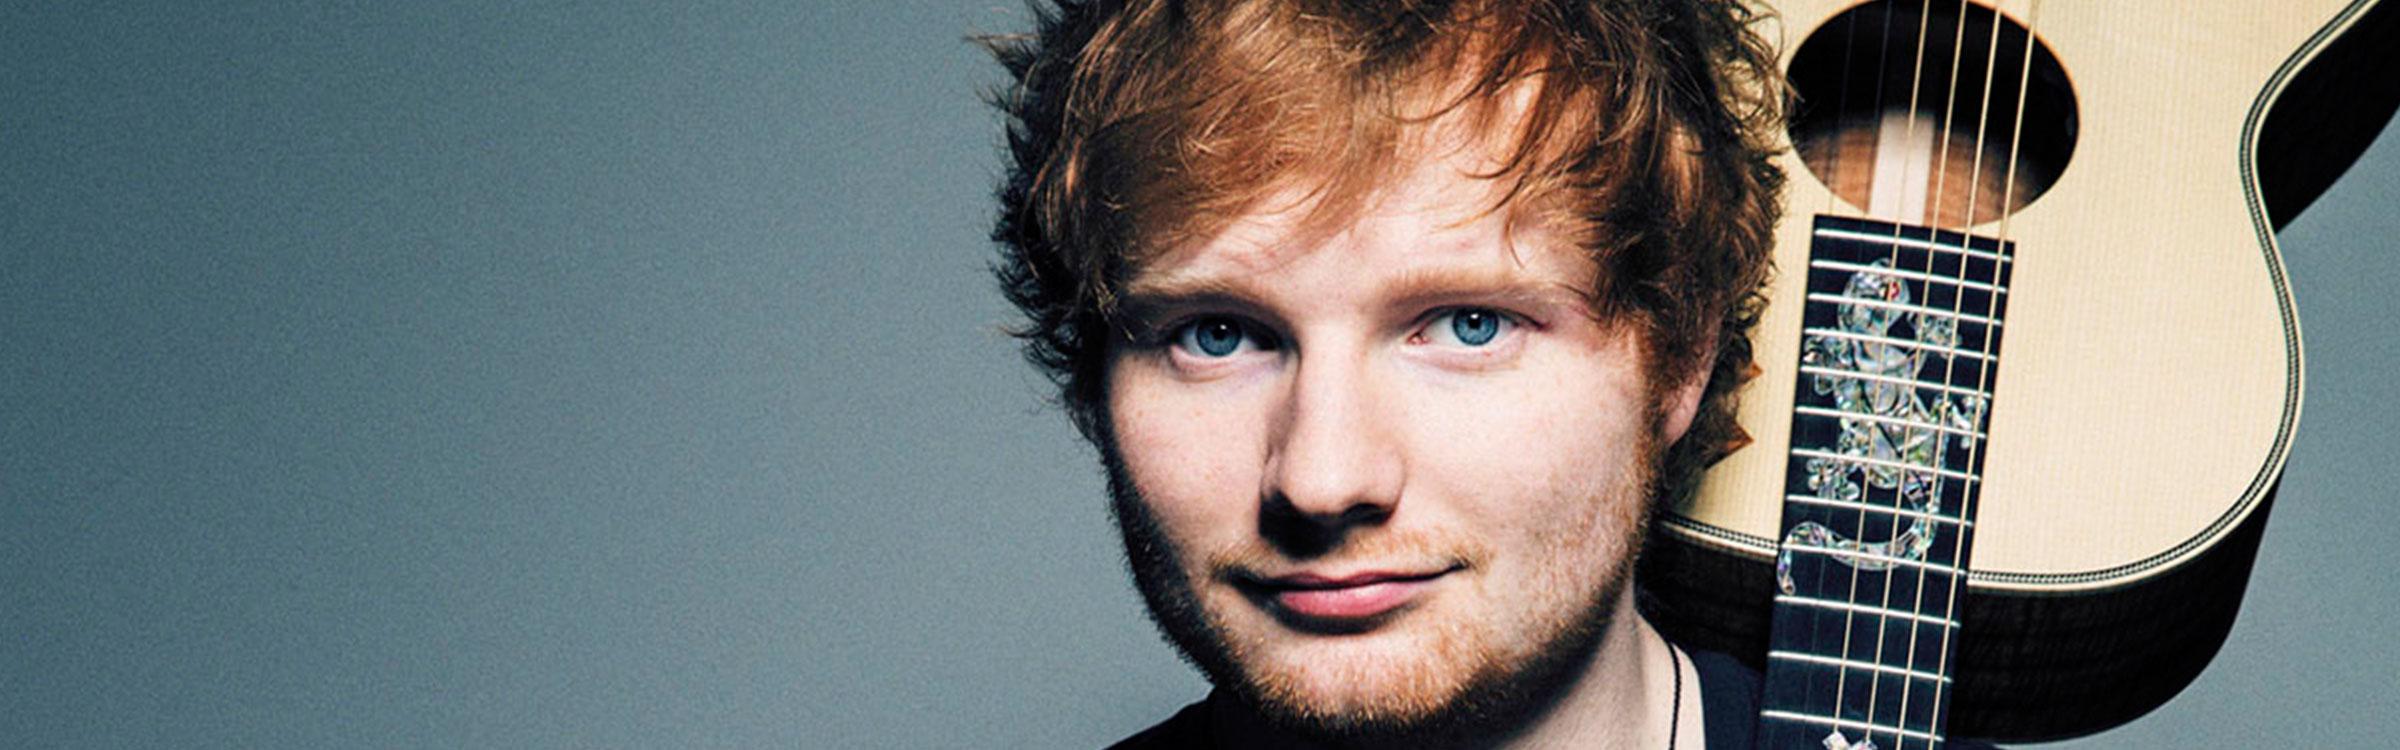 Ed sheeran header 6mrt